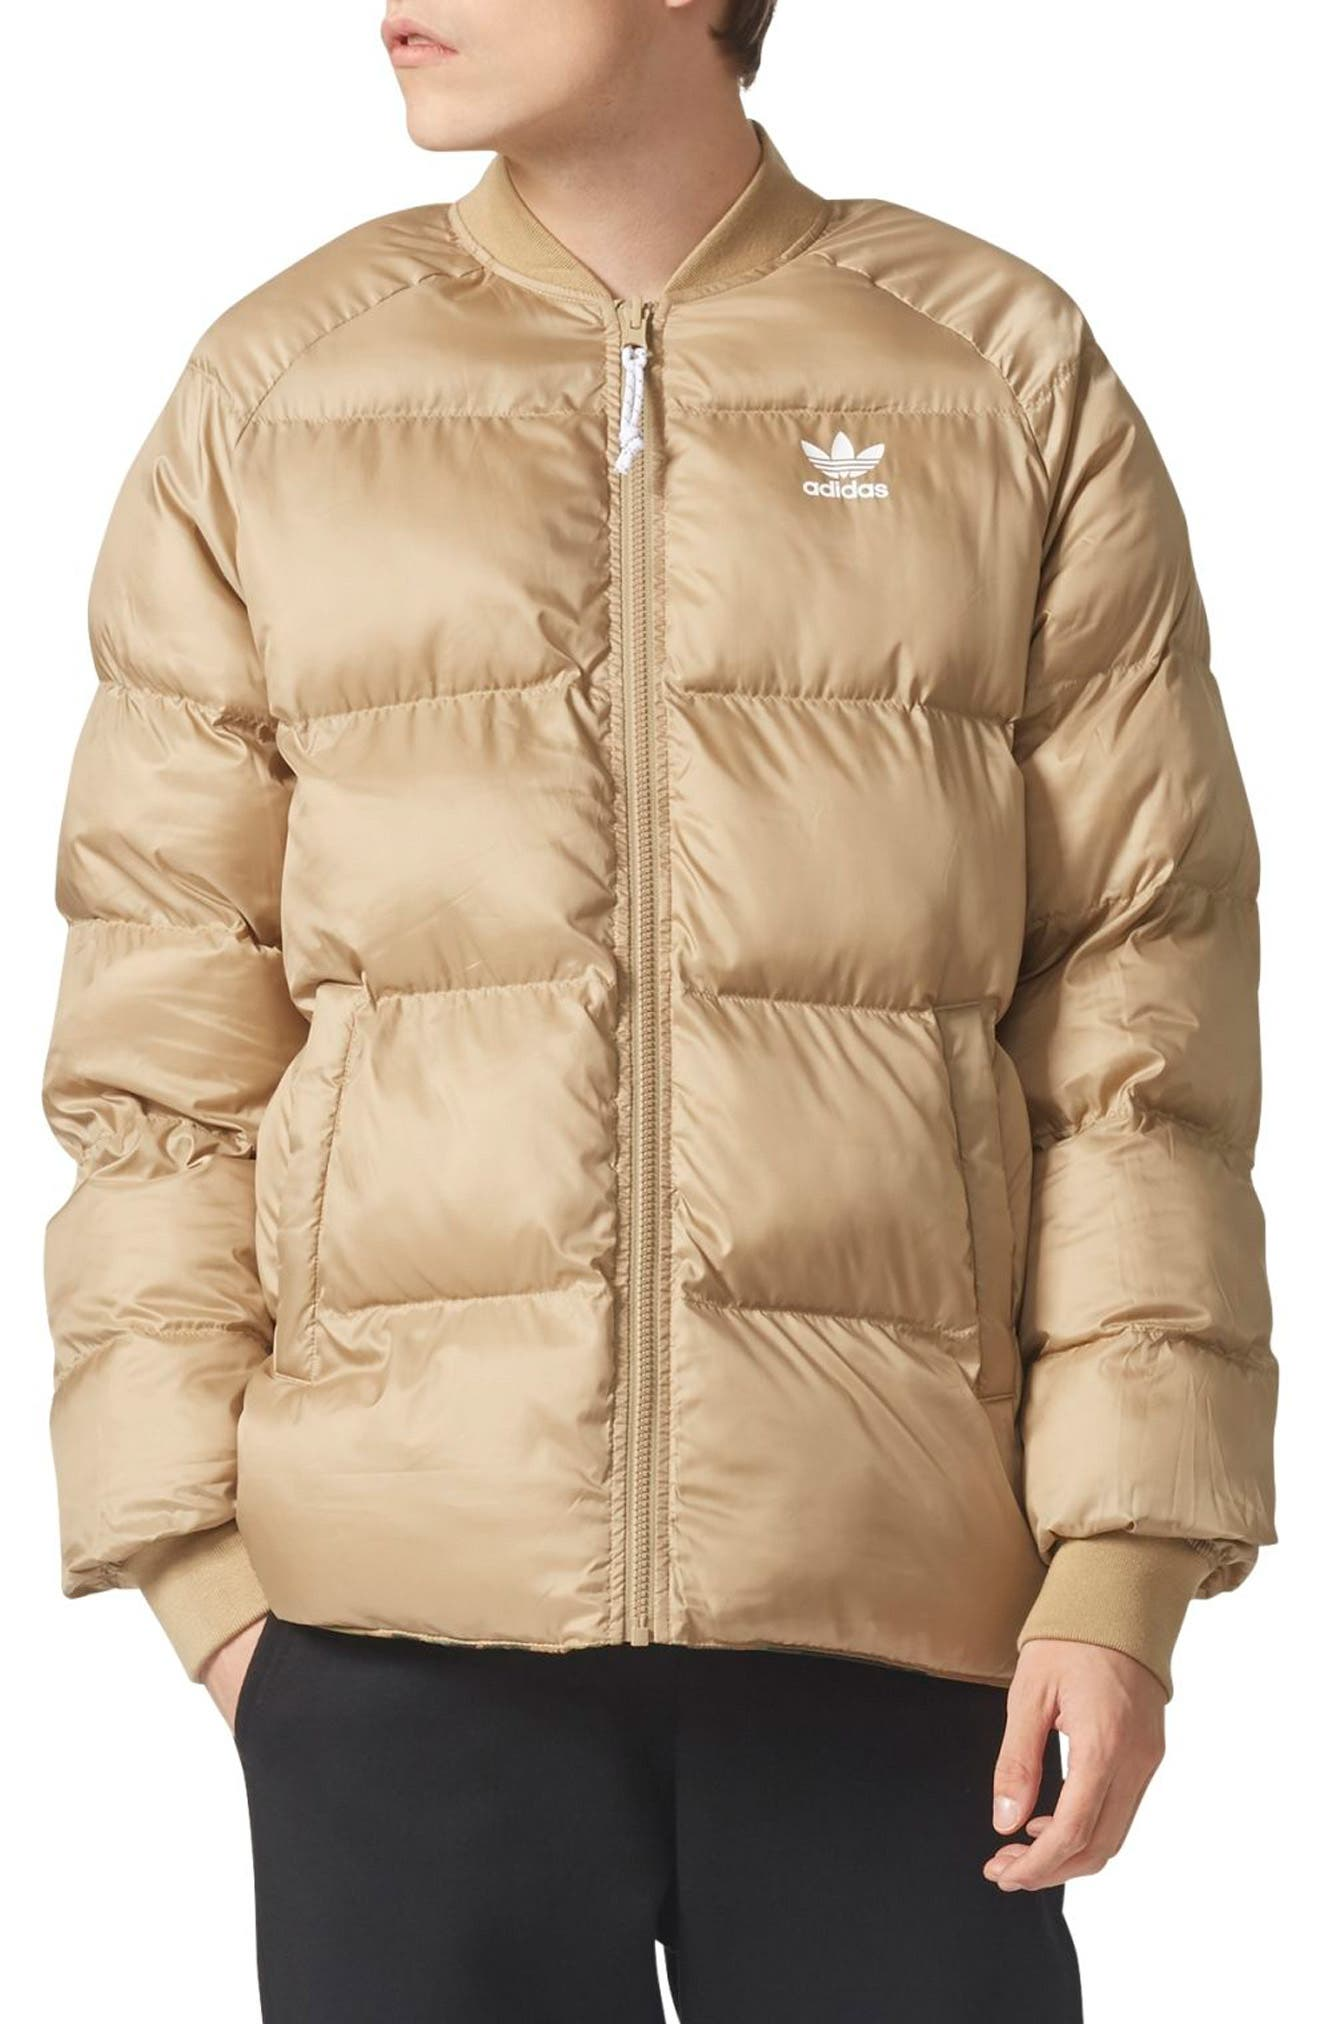 Originals SST Reversible Winter Jacket,                             Alternate thumbnail 4, color,                             Camo/ Hemp